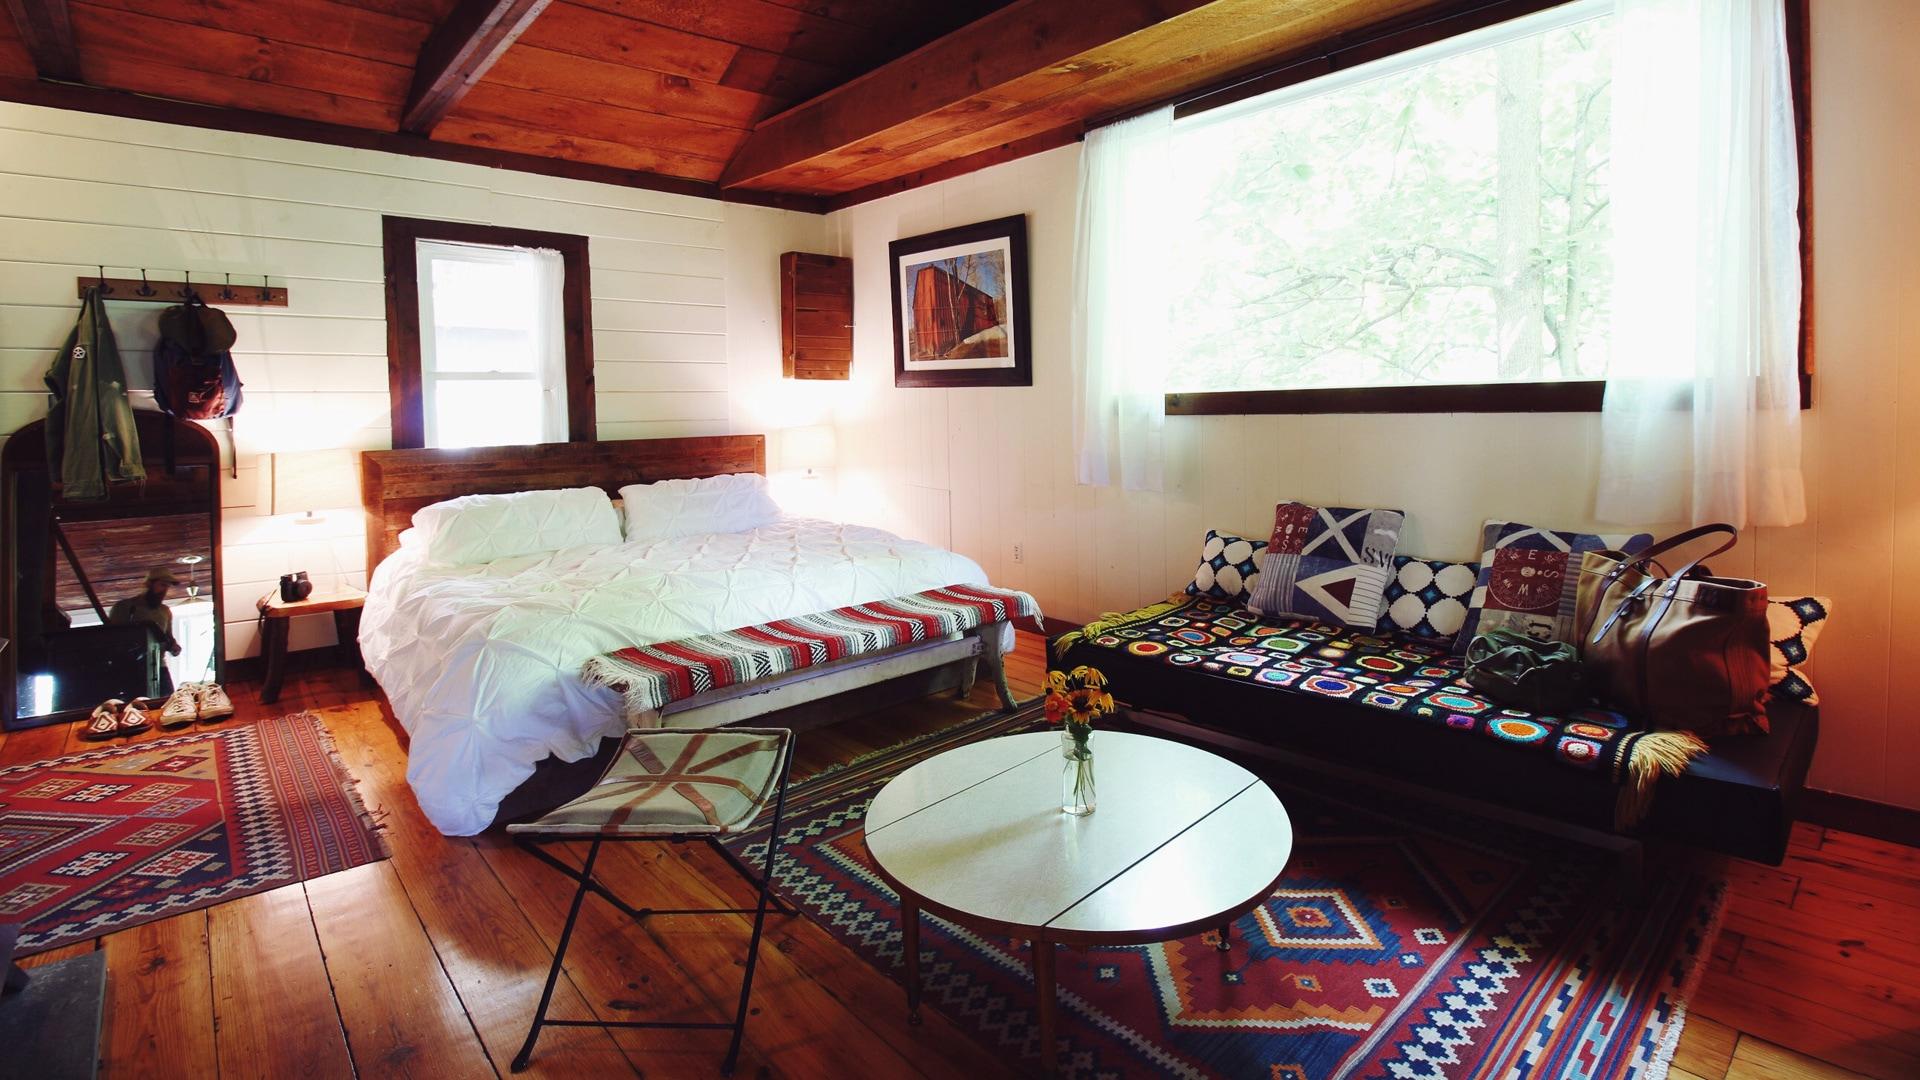 Weekend Getaway To Woodstock New York Pursuits With Enterprise